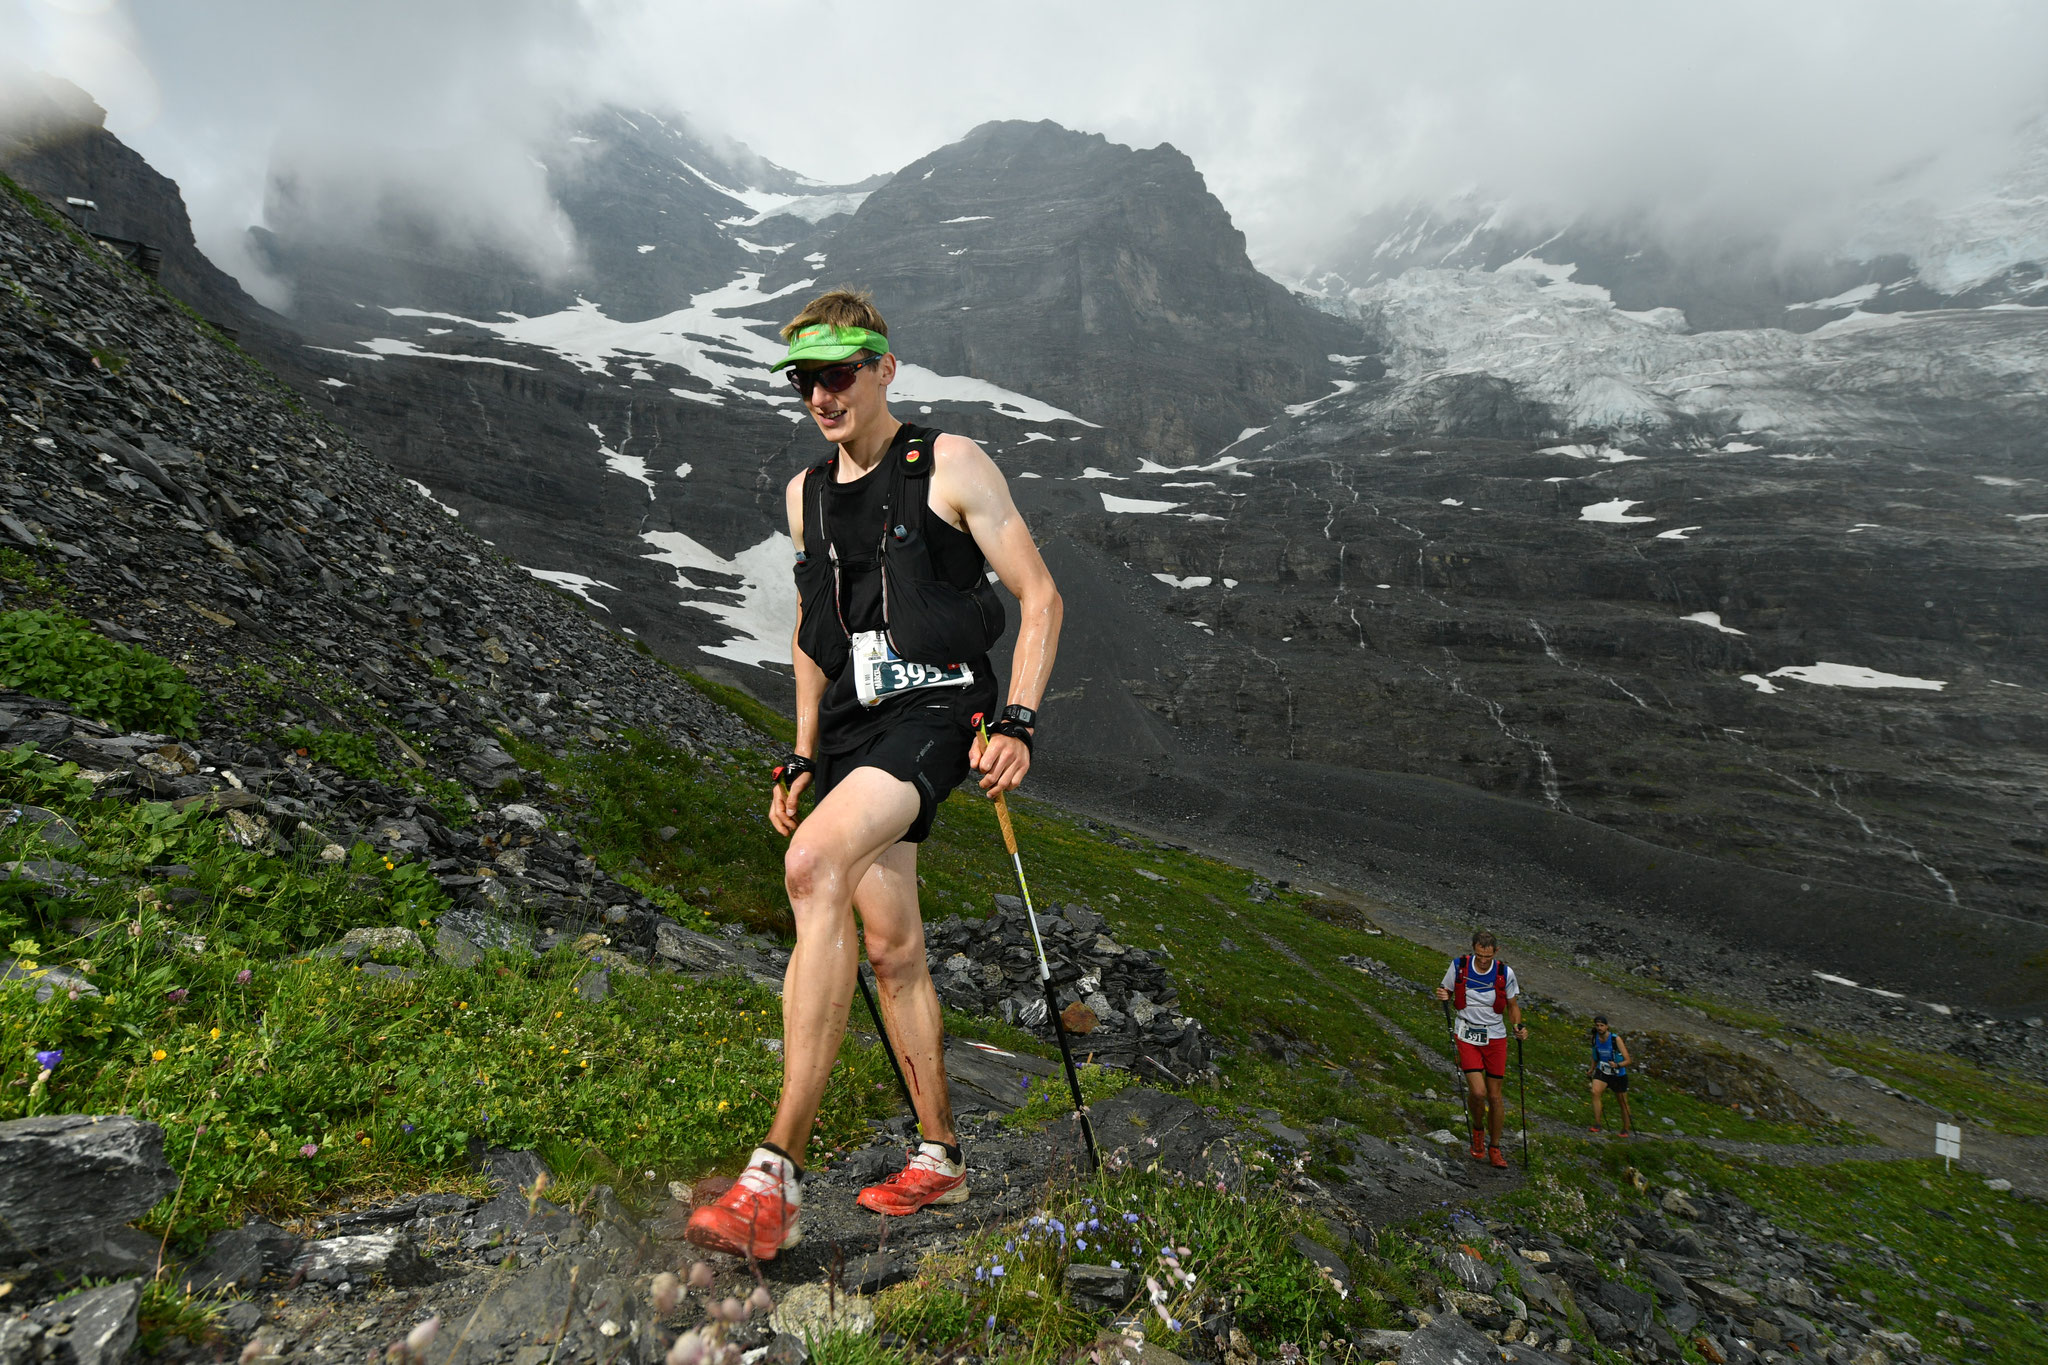 Eiger Ultra Trail 2018 (101km/6700hm)